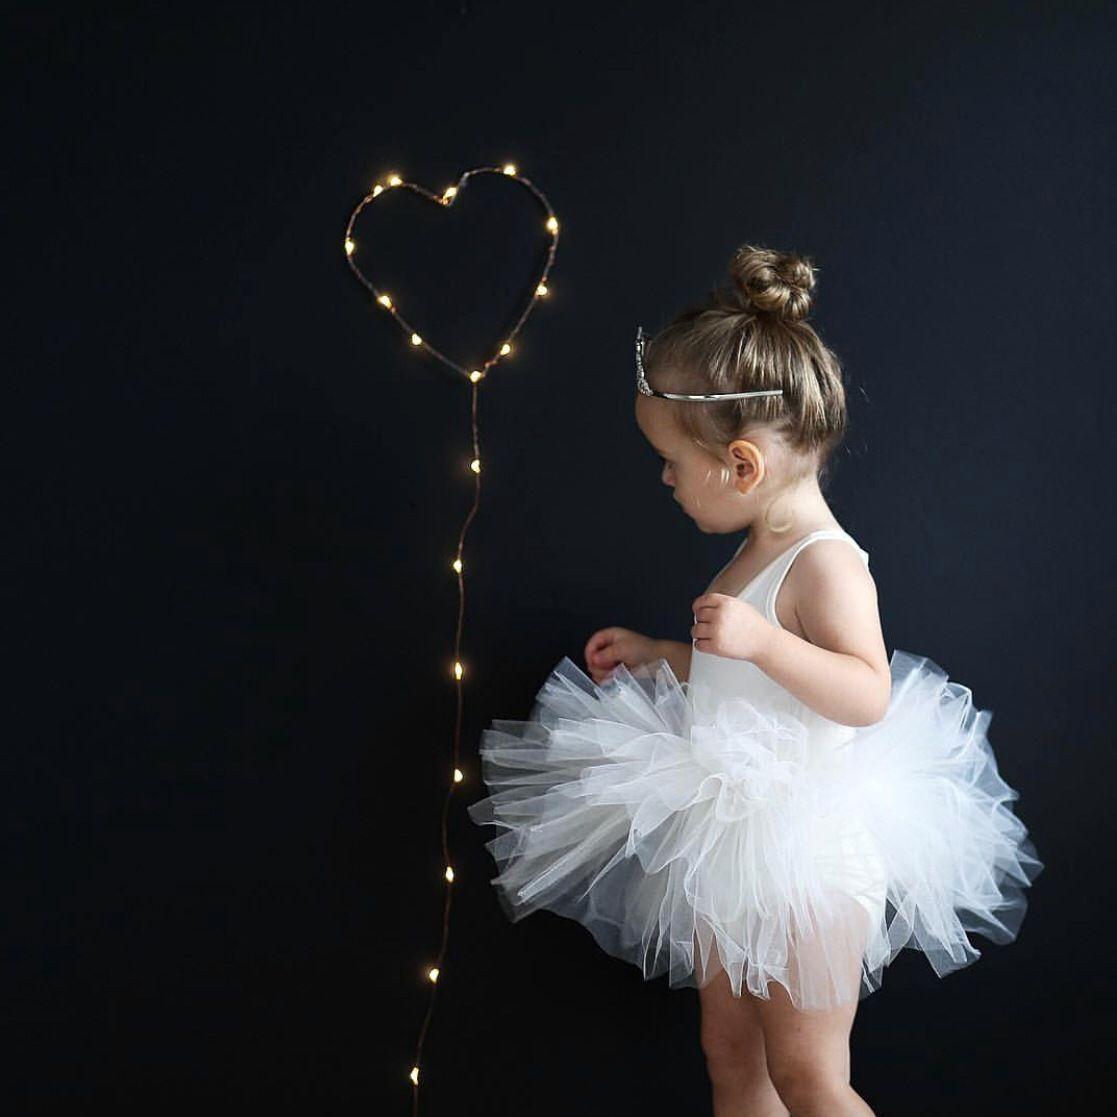 Kids Cake Skirt Girls Tutu Fluffy petticoat Princess Ballet Dance Tutu Skirt